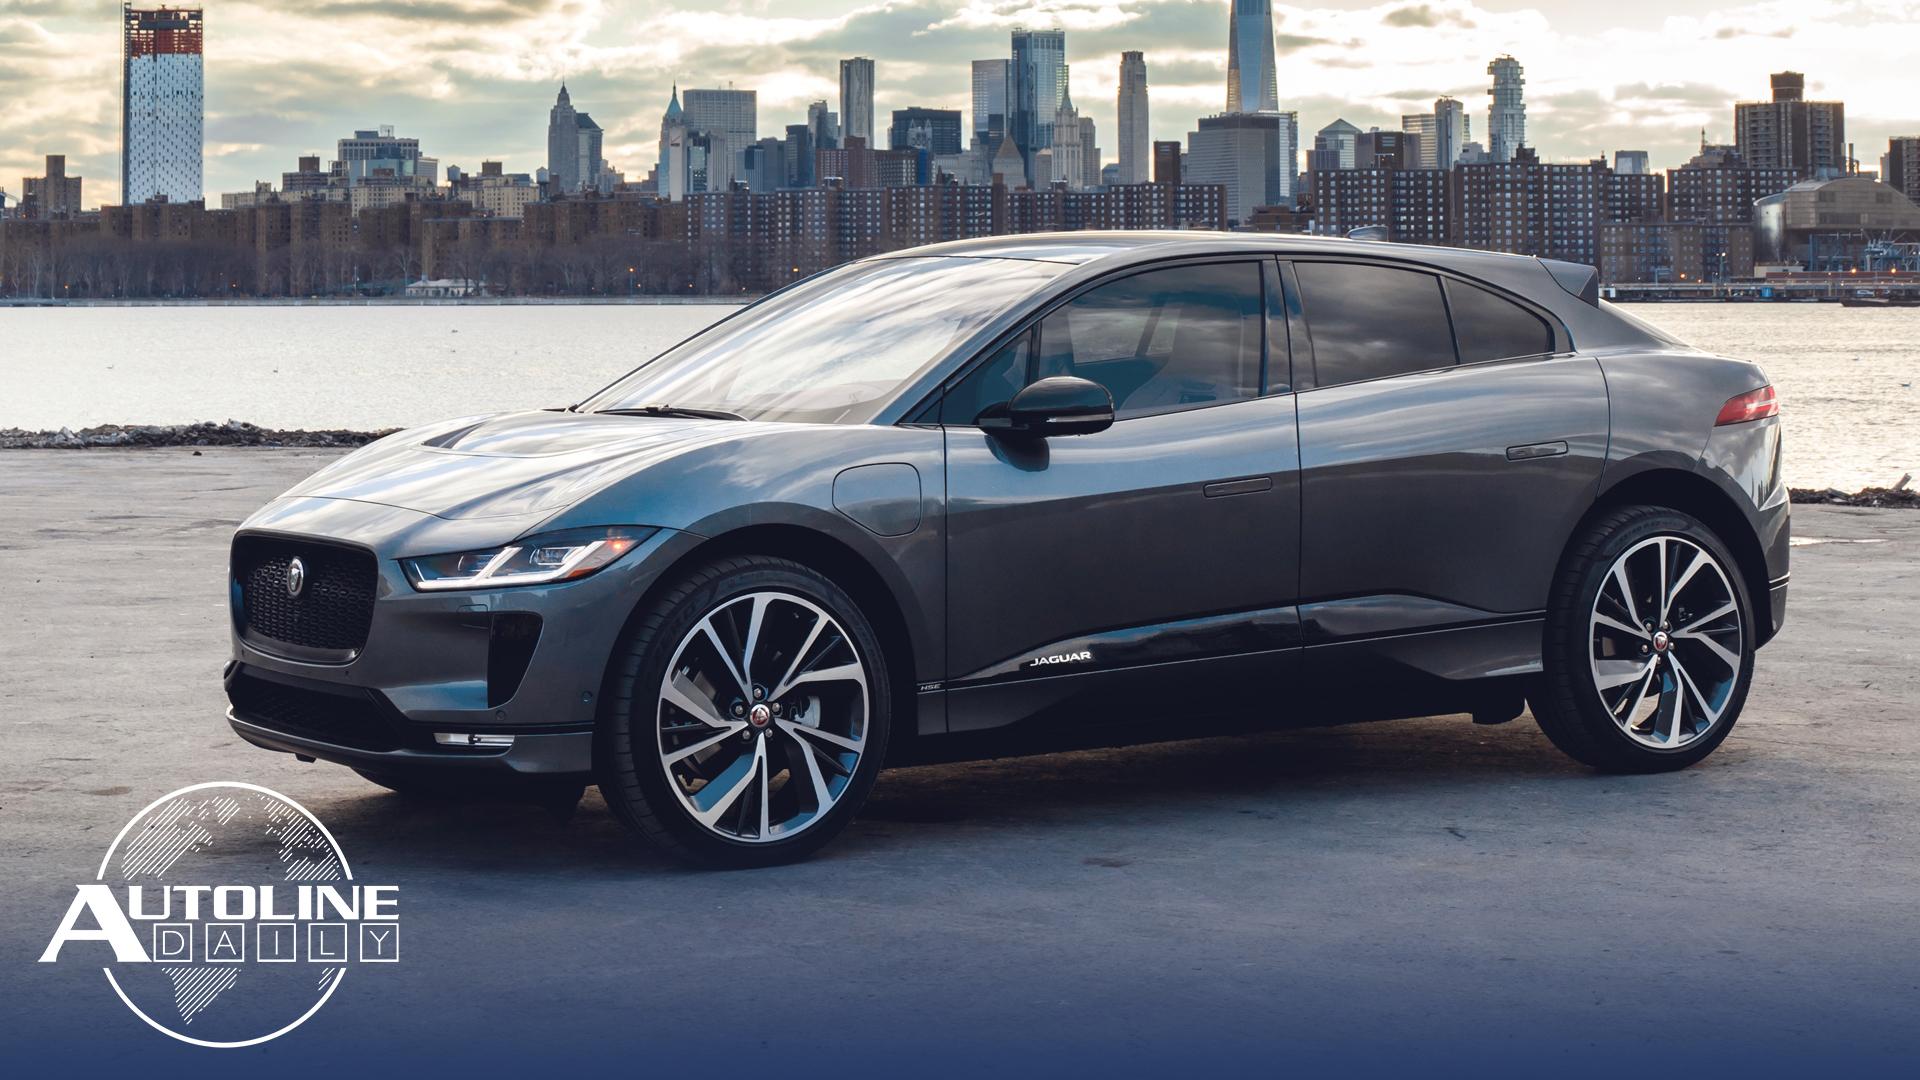 AD #2655 – Jaguar Going After Tesla Owners, OEMs Won't Make